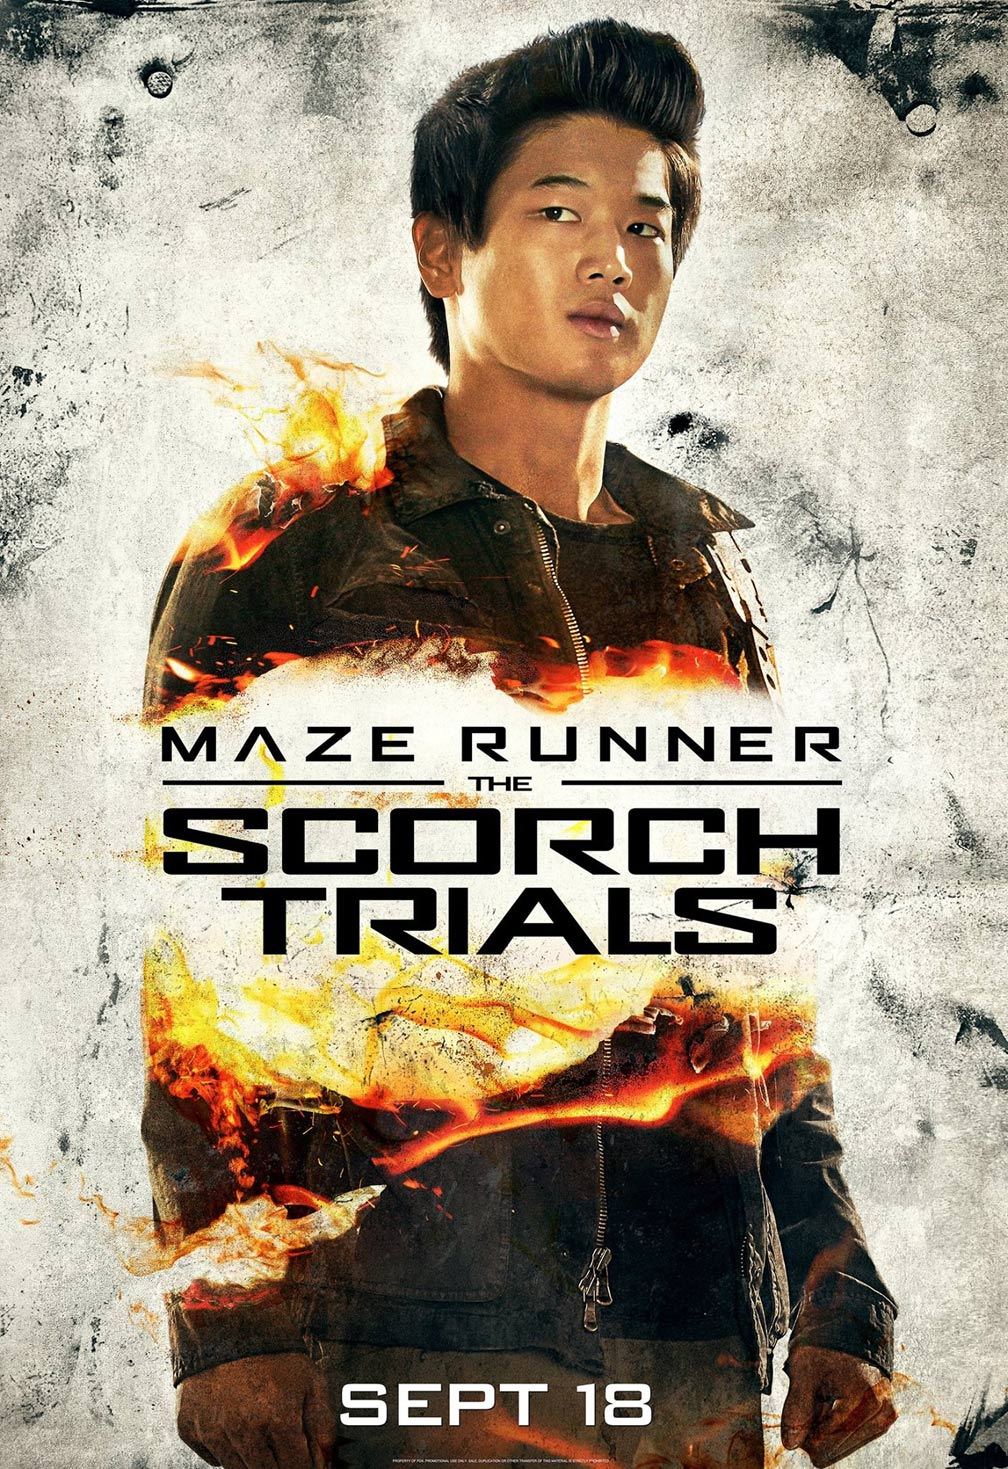 Maze Runner: The Scorch Trials (2015) Posters - TrailerAddict